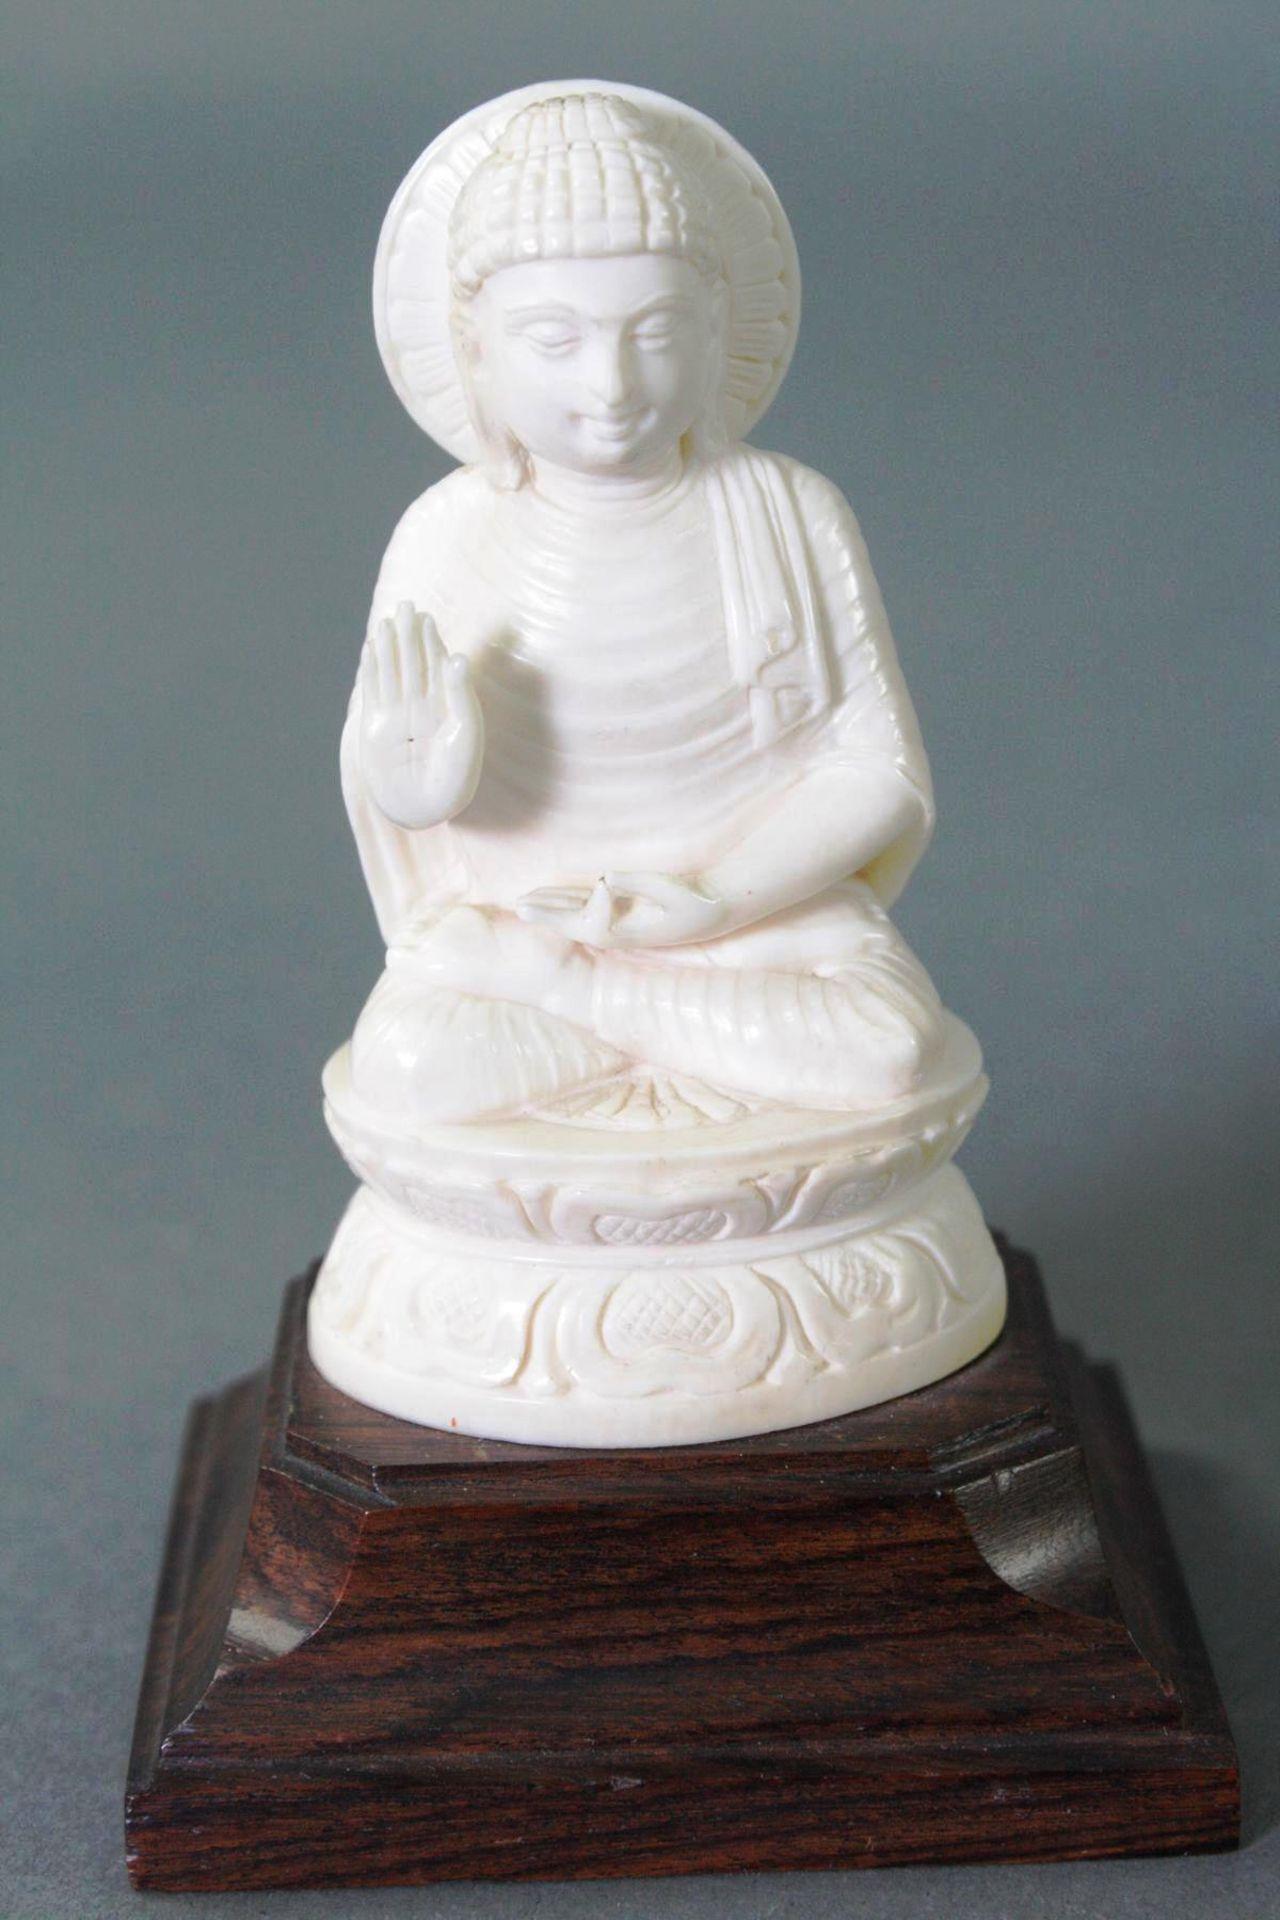 Konvolut Asiatika, Korea, Thailand, Bali, 19./20. Jahrhundert - Bild 2 aus 10